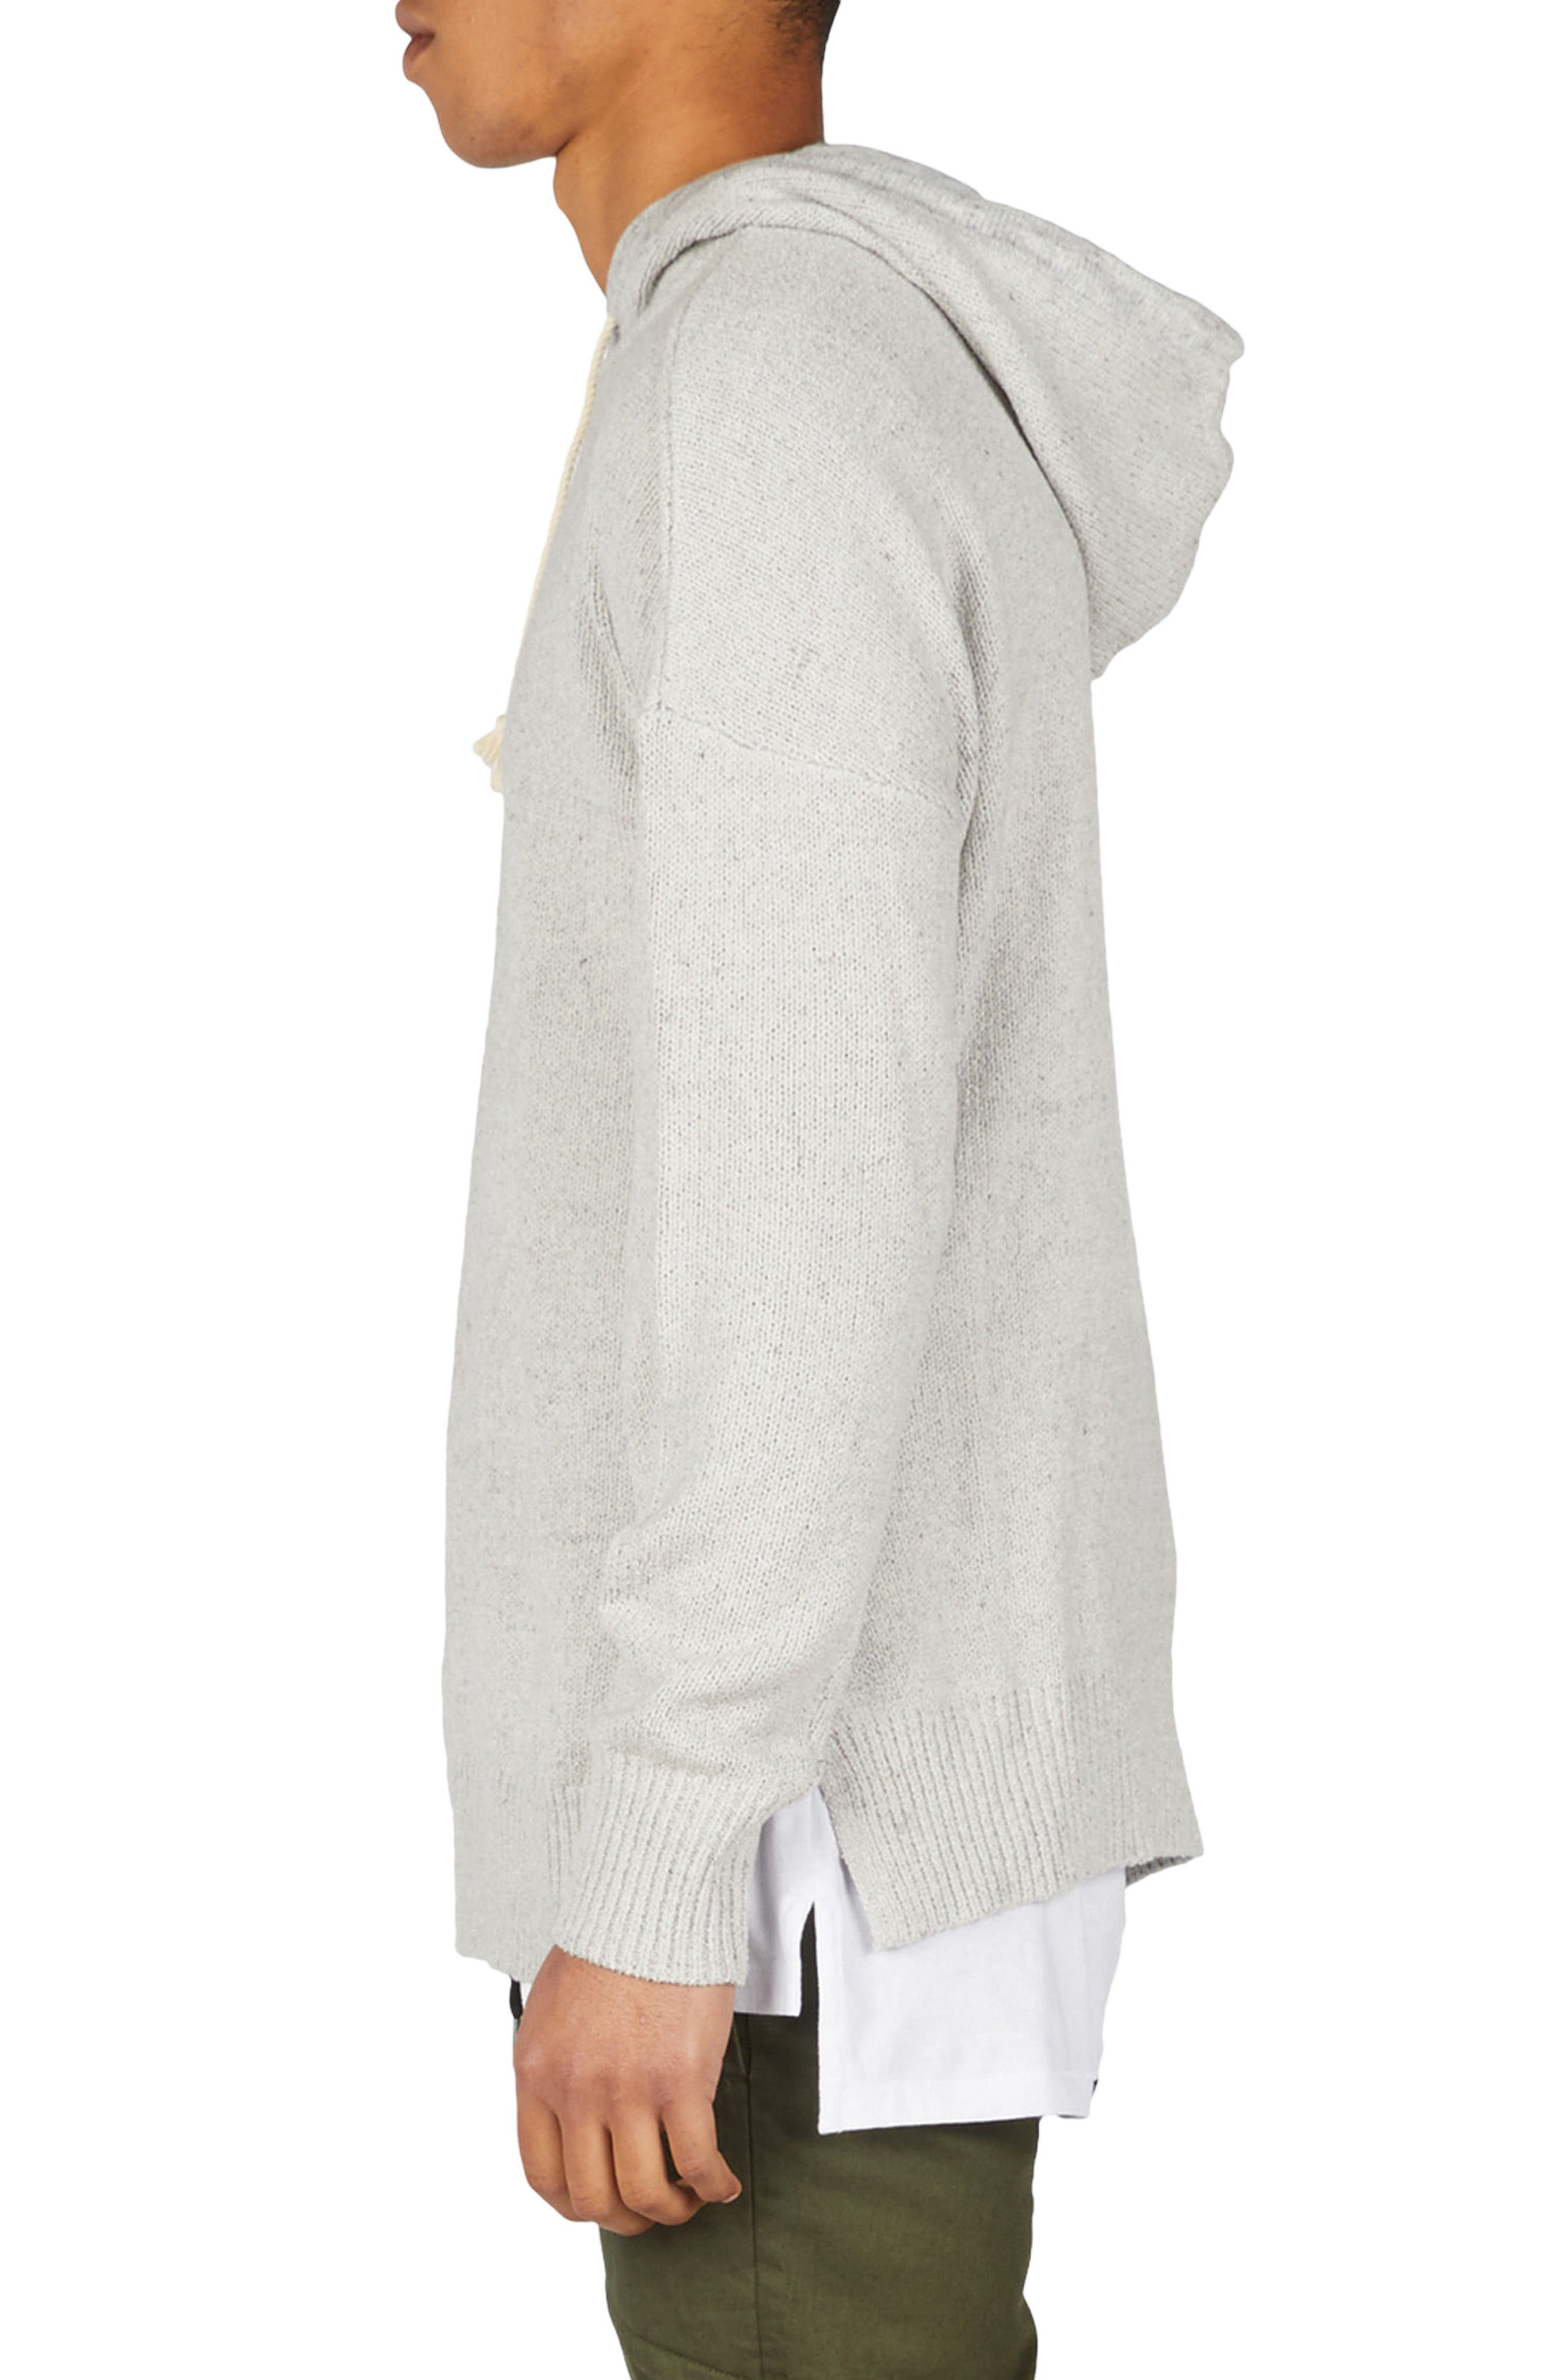 Towel Knit Hooded Sweatshirt,                             Alternate thumbnail 3, color,                             Grey